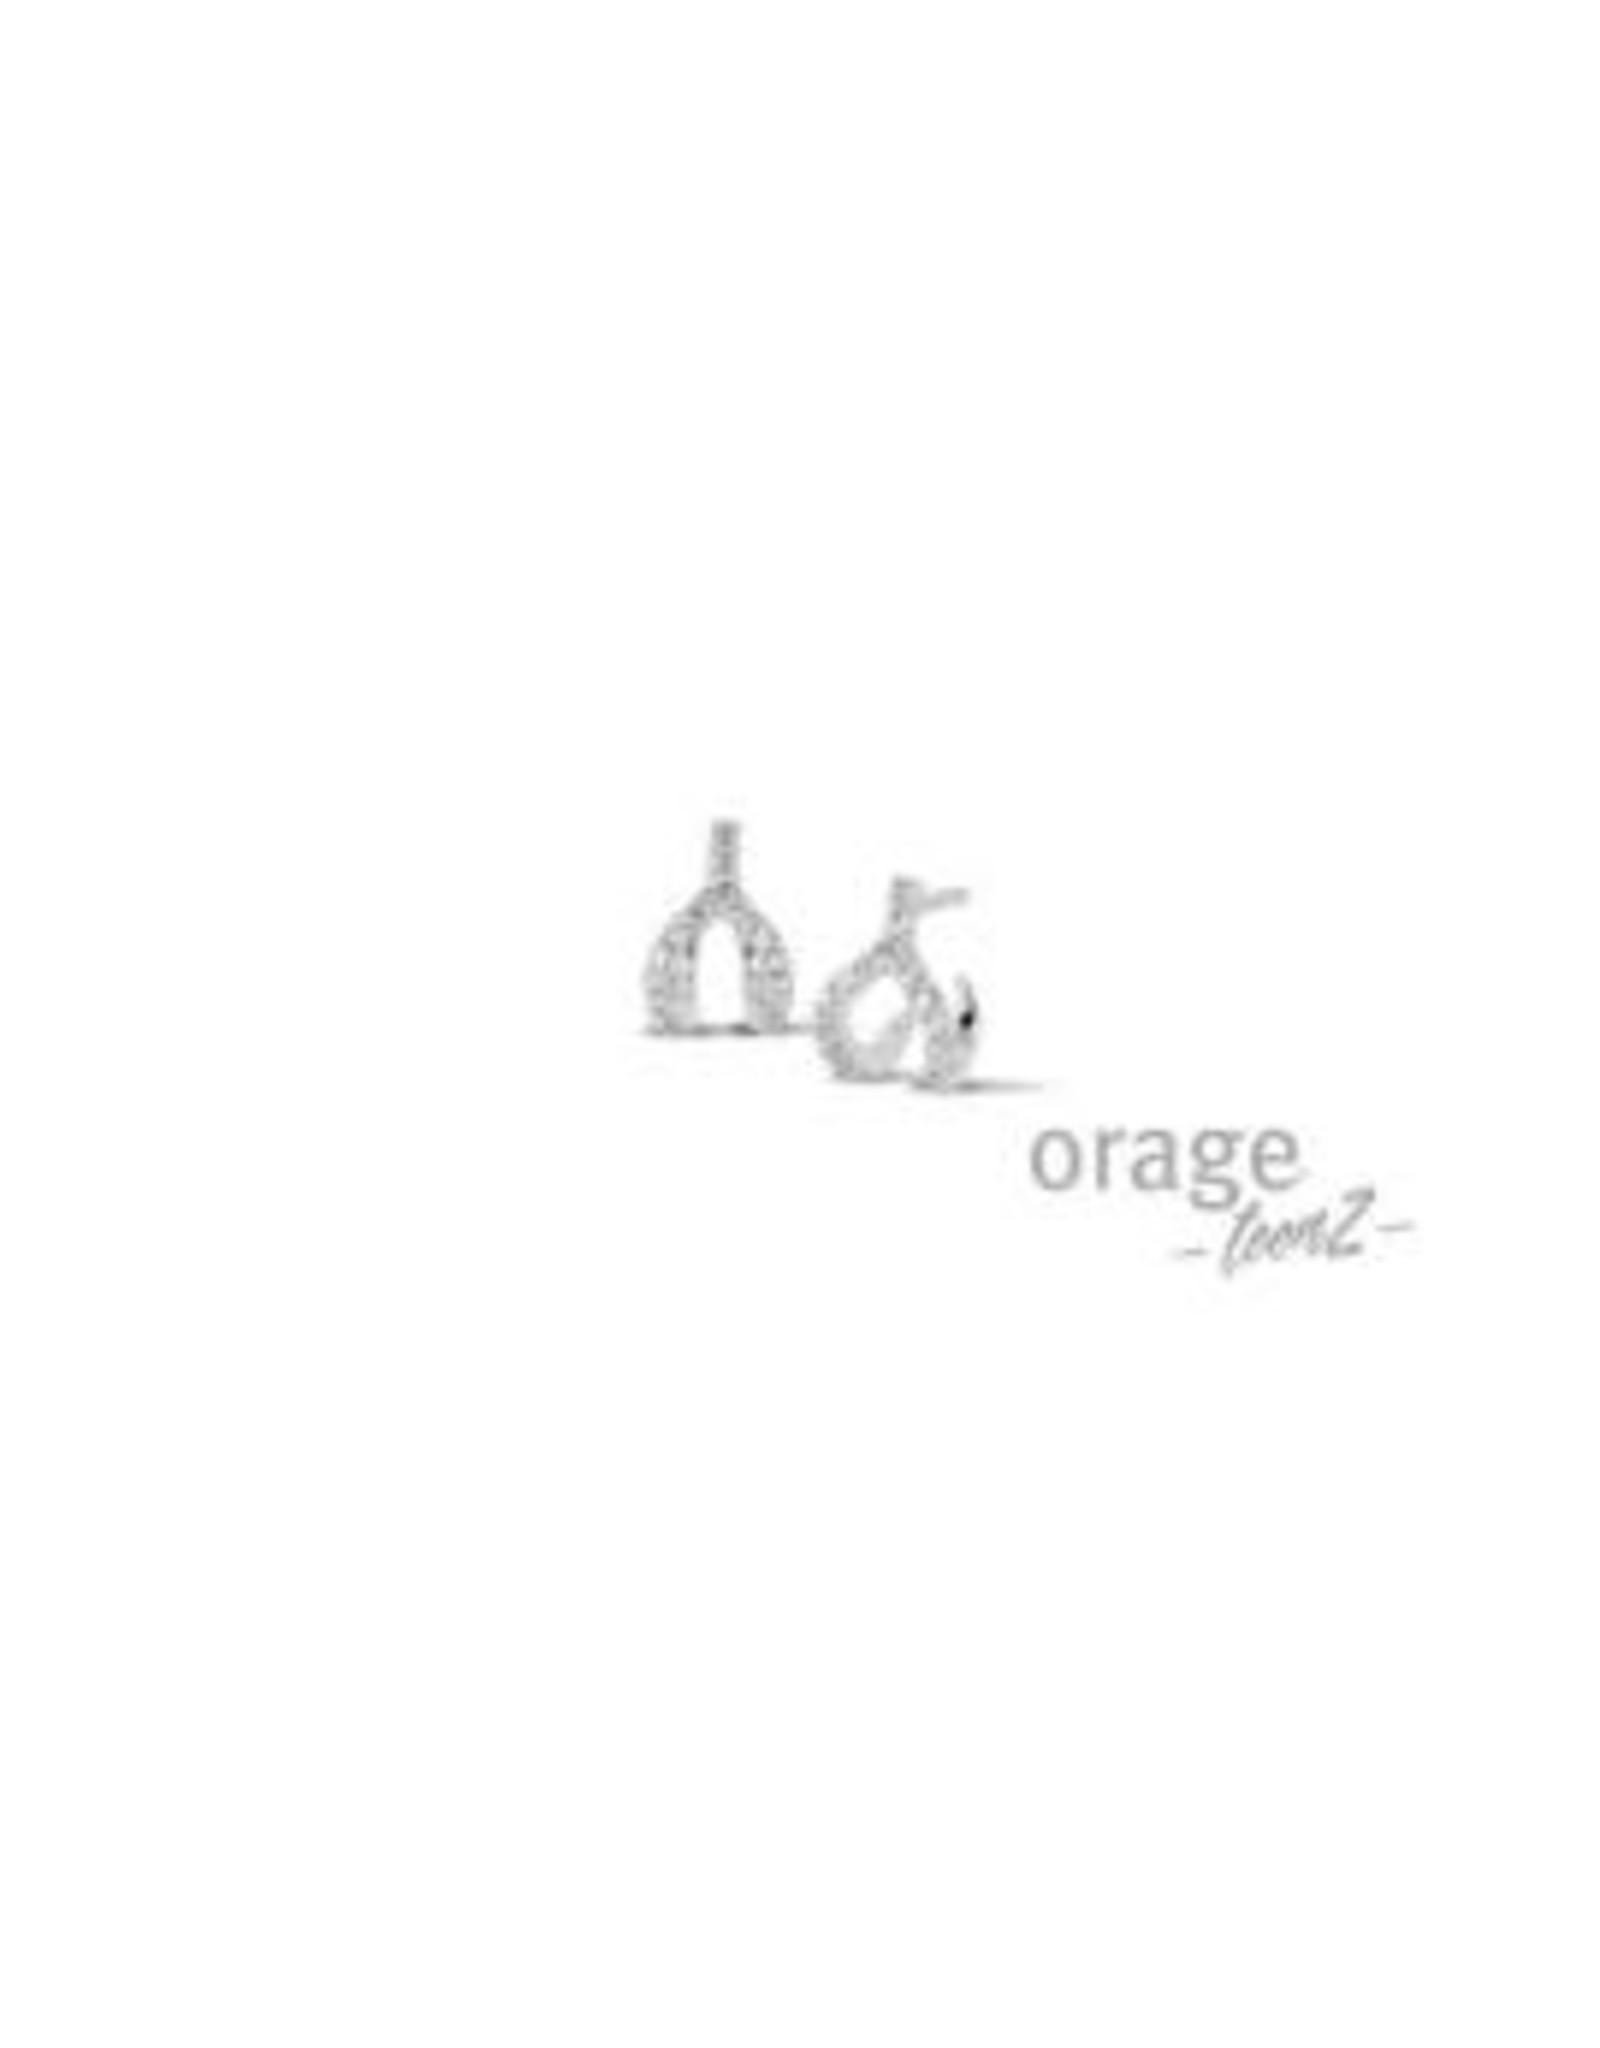 Orage Teenz Oorbellen Orage Teenz Zilver Wishbone T169